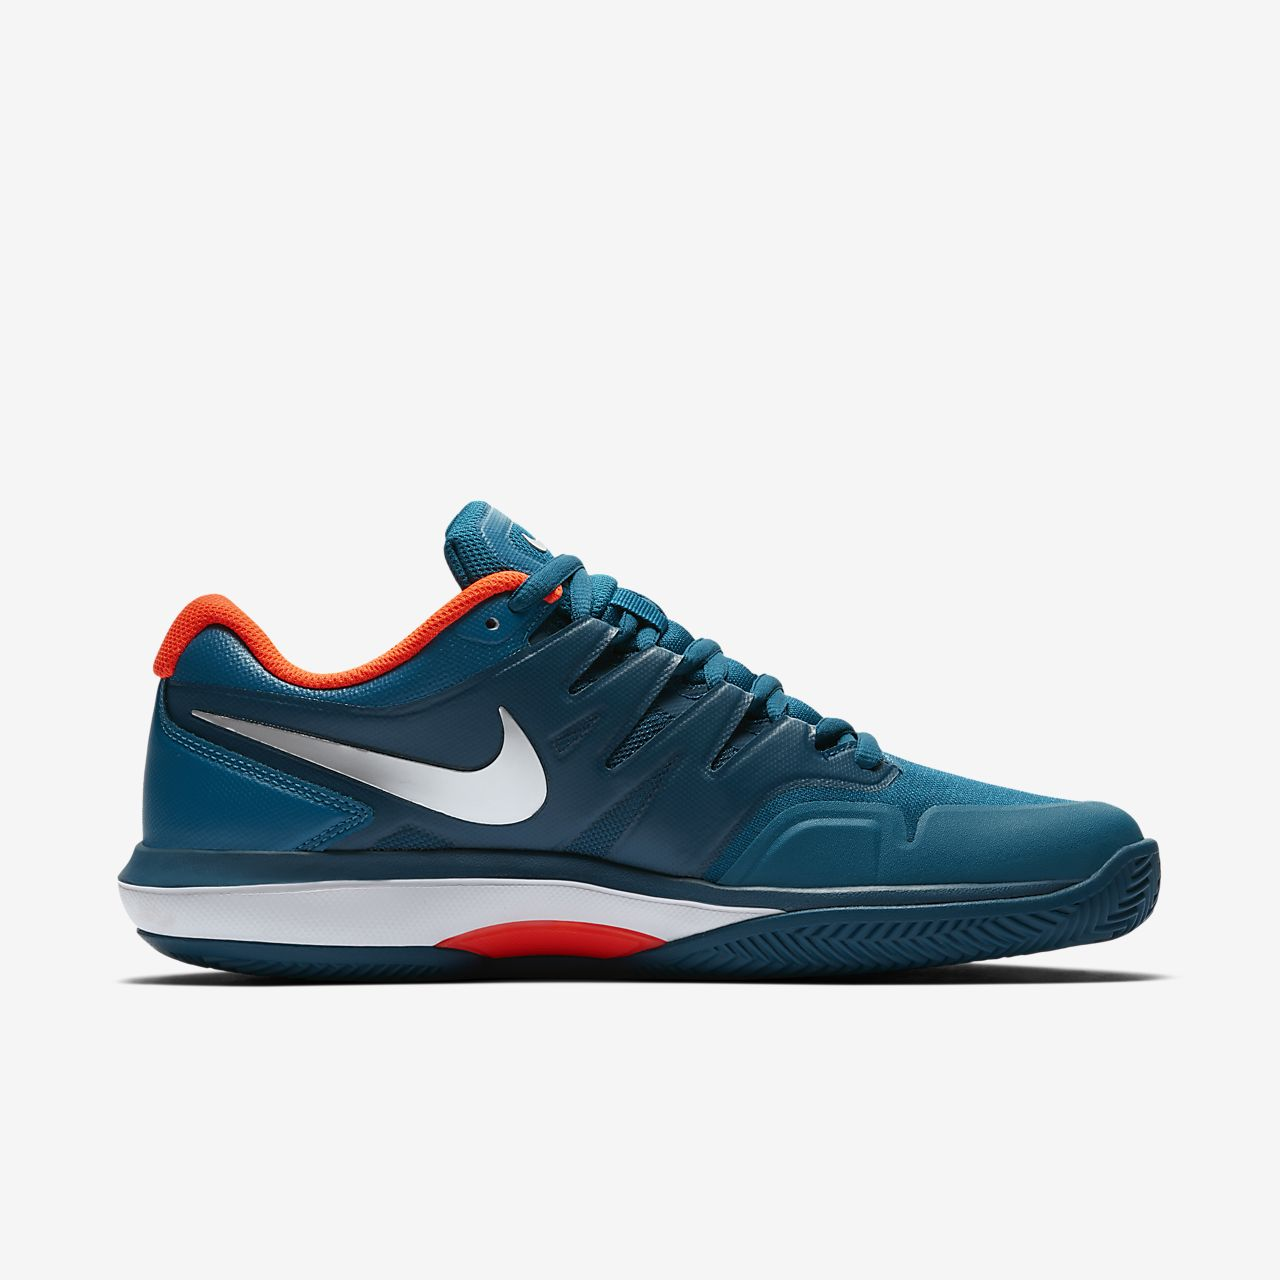 Nike Air Zoom Prestige Clay JPYKnZ14